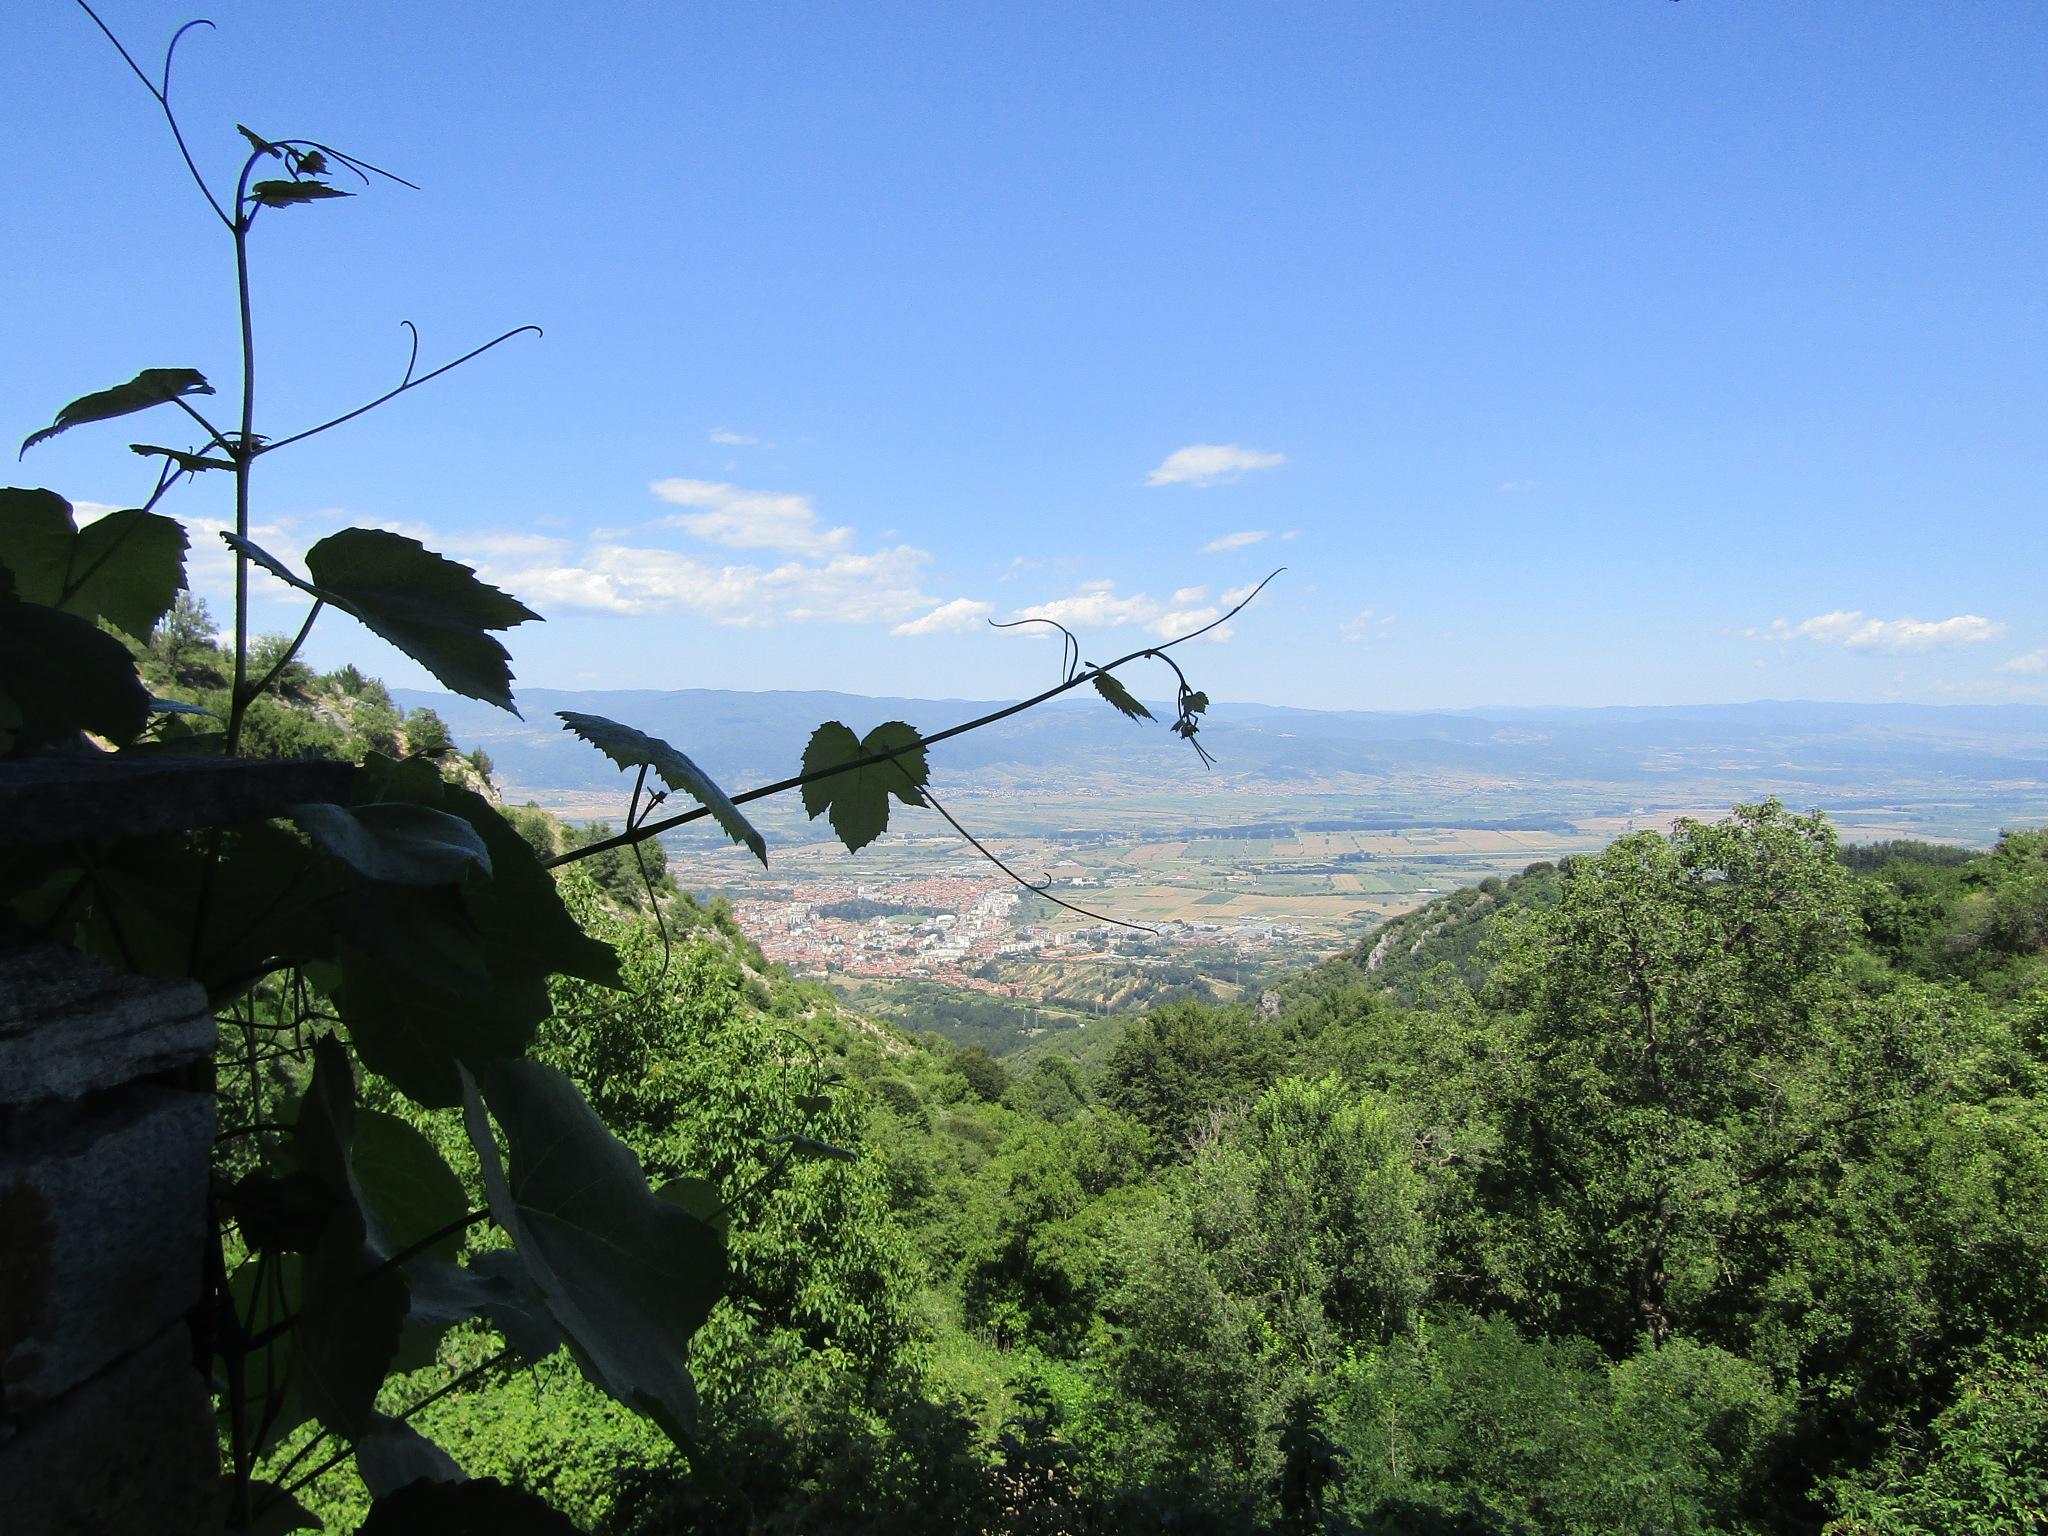 View by Hari62